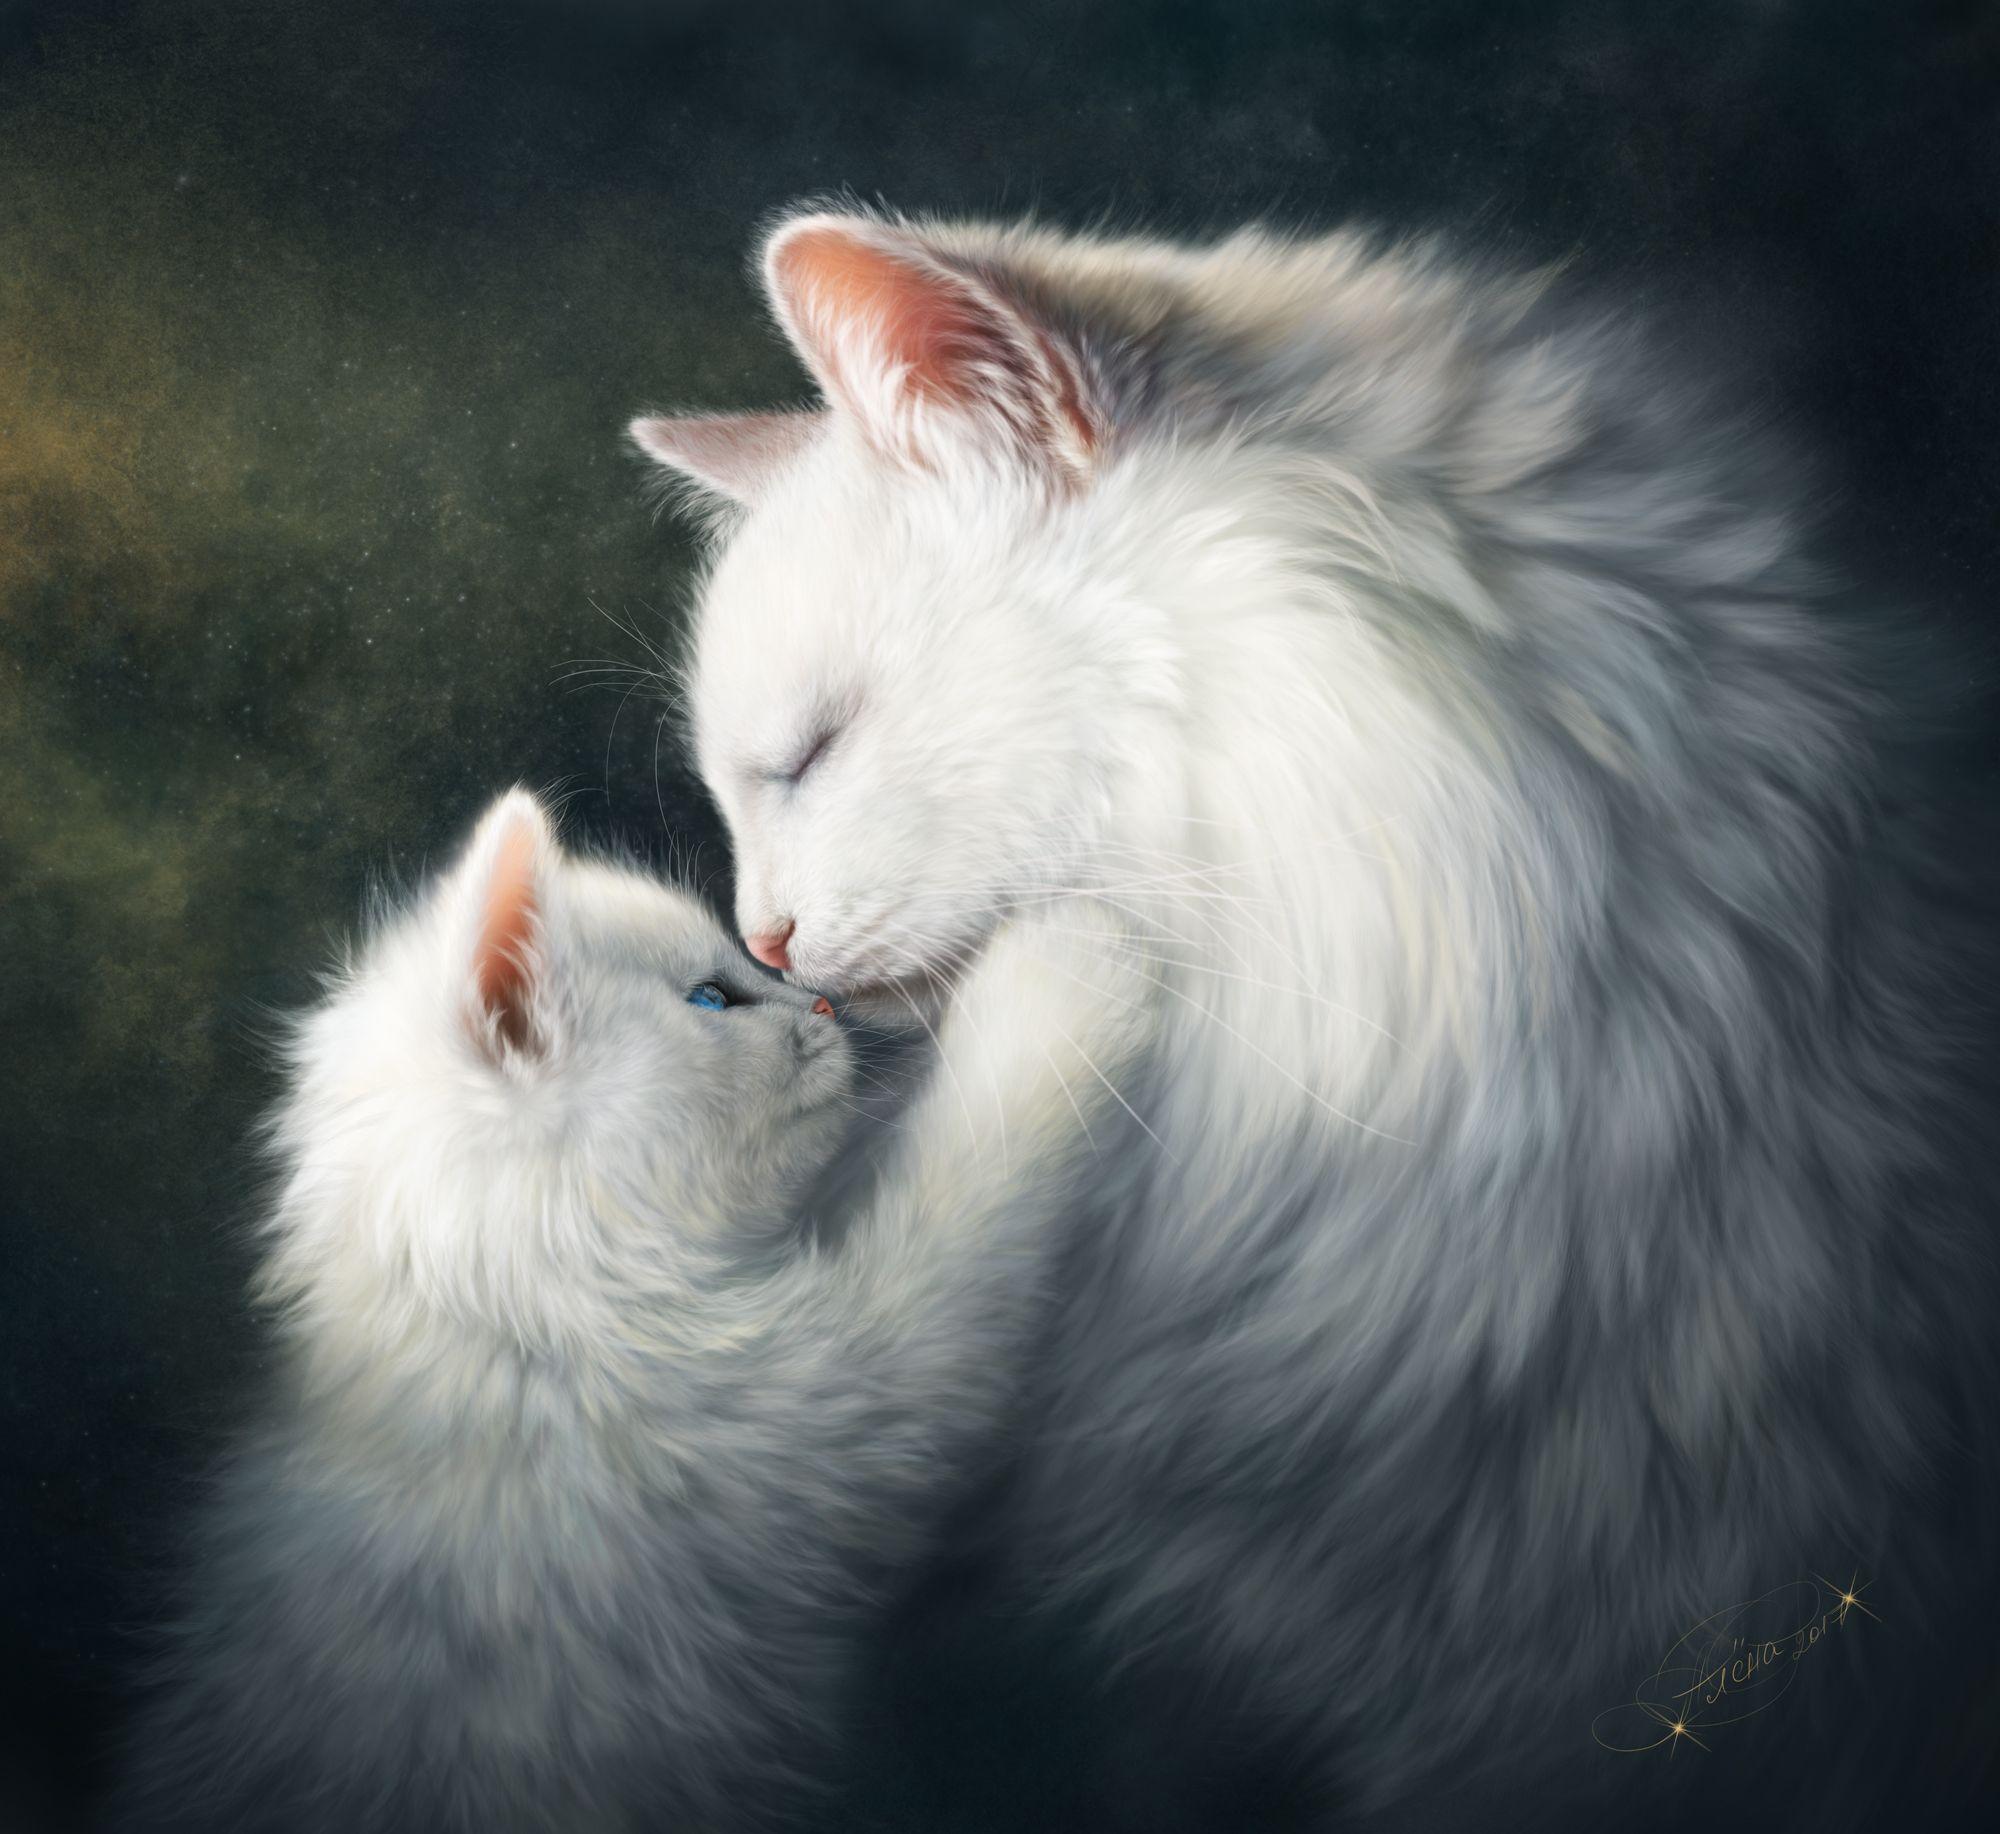 Tenderness By Alenaekaterinburg Pinturas De Gato Gatitos Lindos Gatos Graciosos